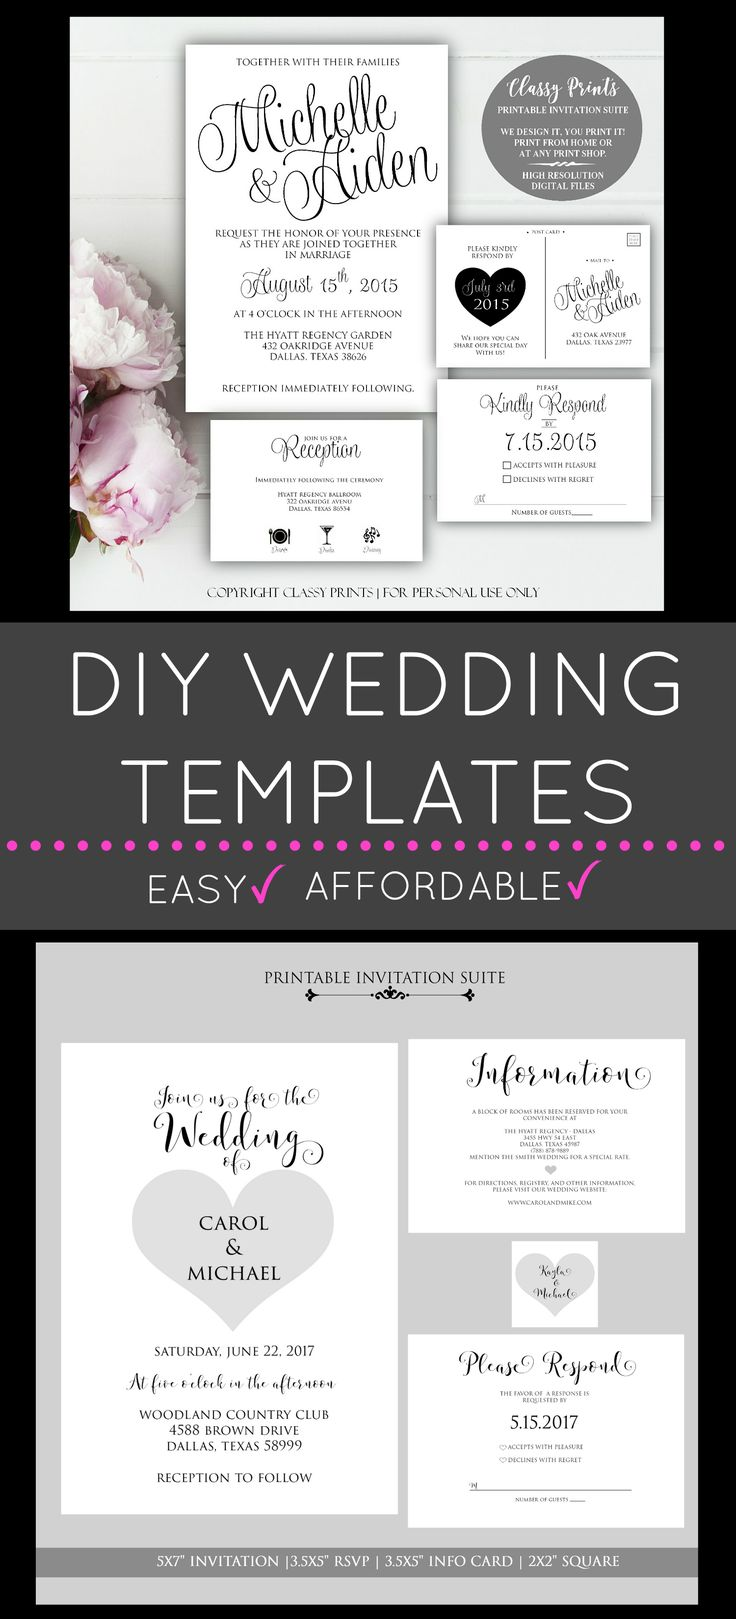 DIY Wedding Invitations, Printable Wedding Invitations, Wedding invitation templates & more!